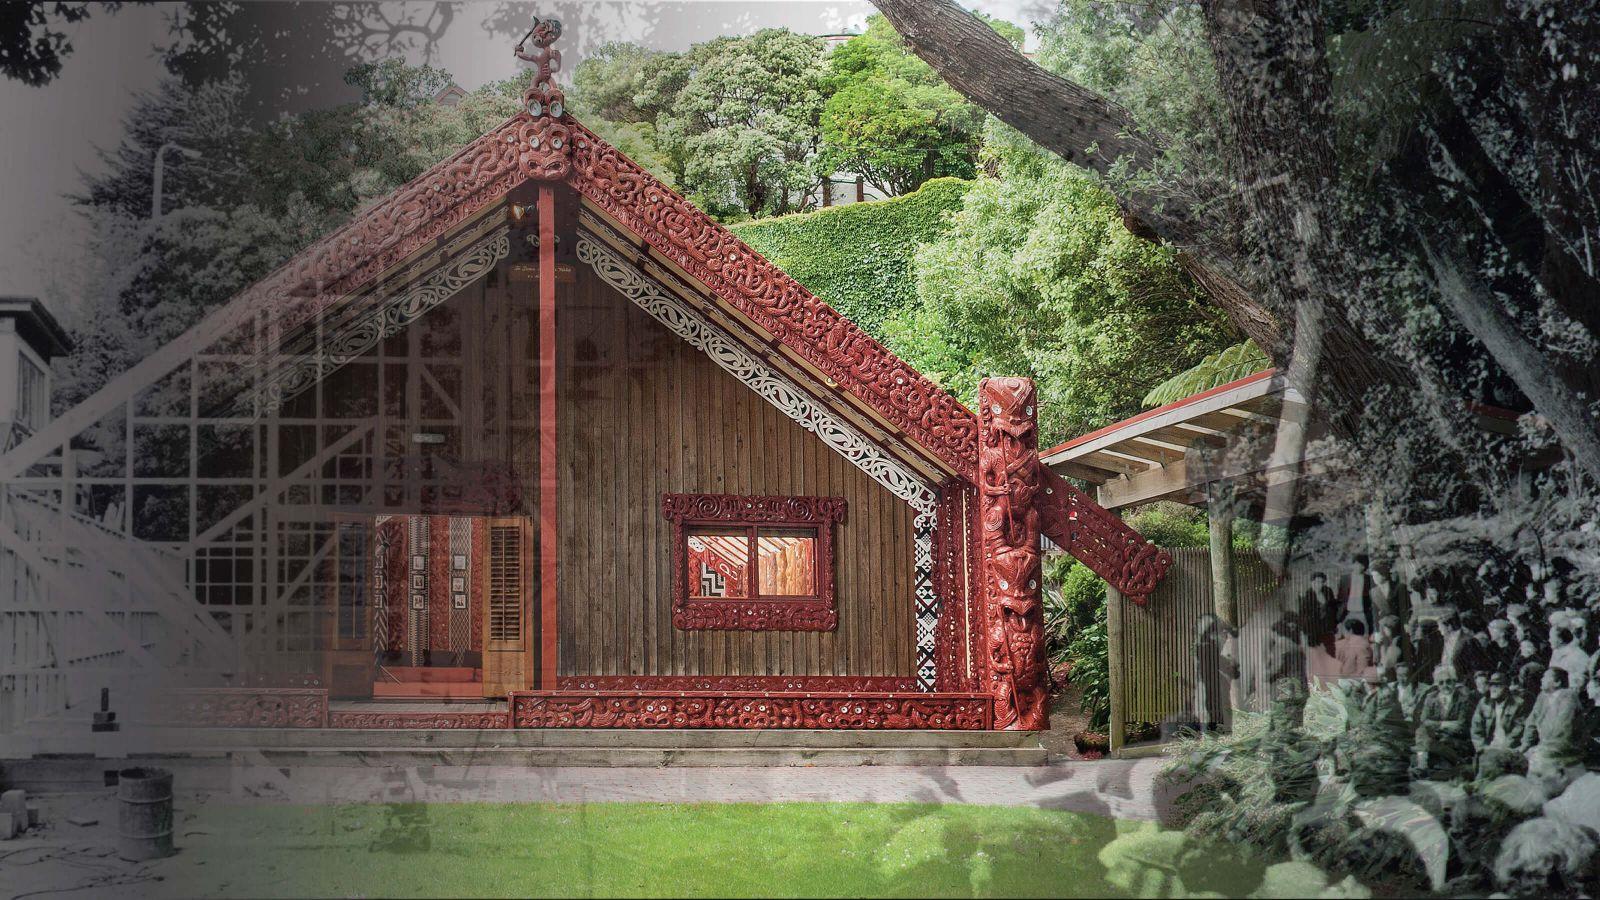 Te Herenga Waka Marae at Victoria University of Wellington, overlaid with black and white photographs of the wharenui during construction